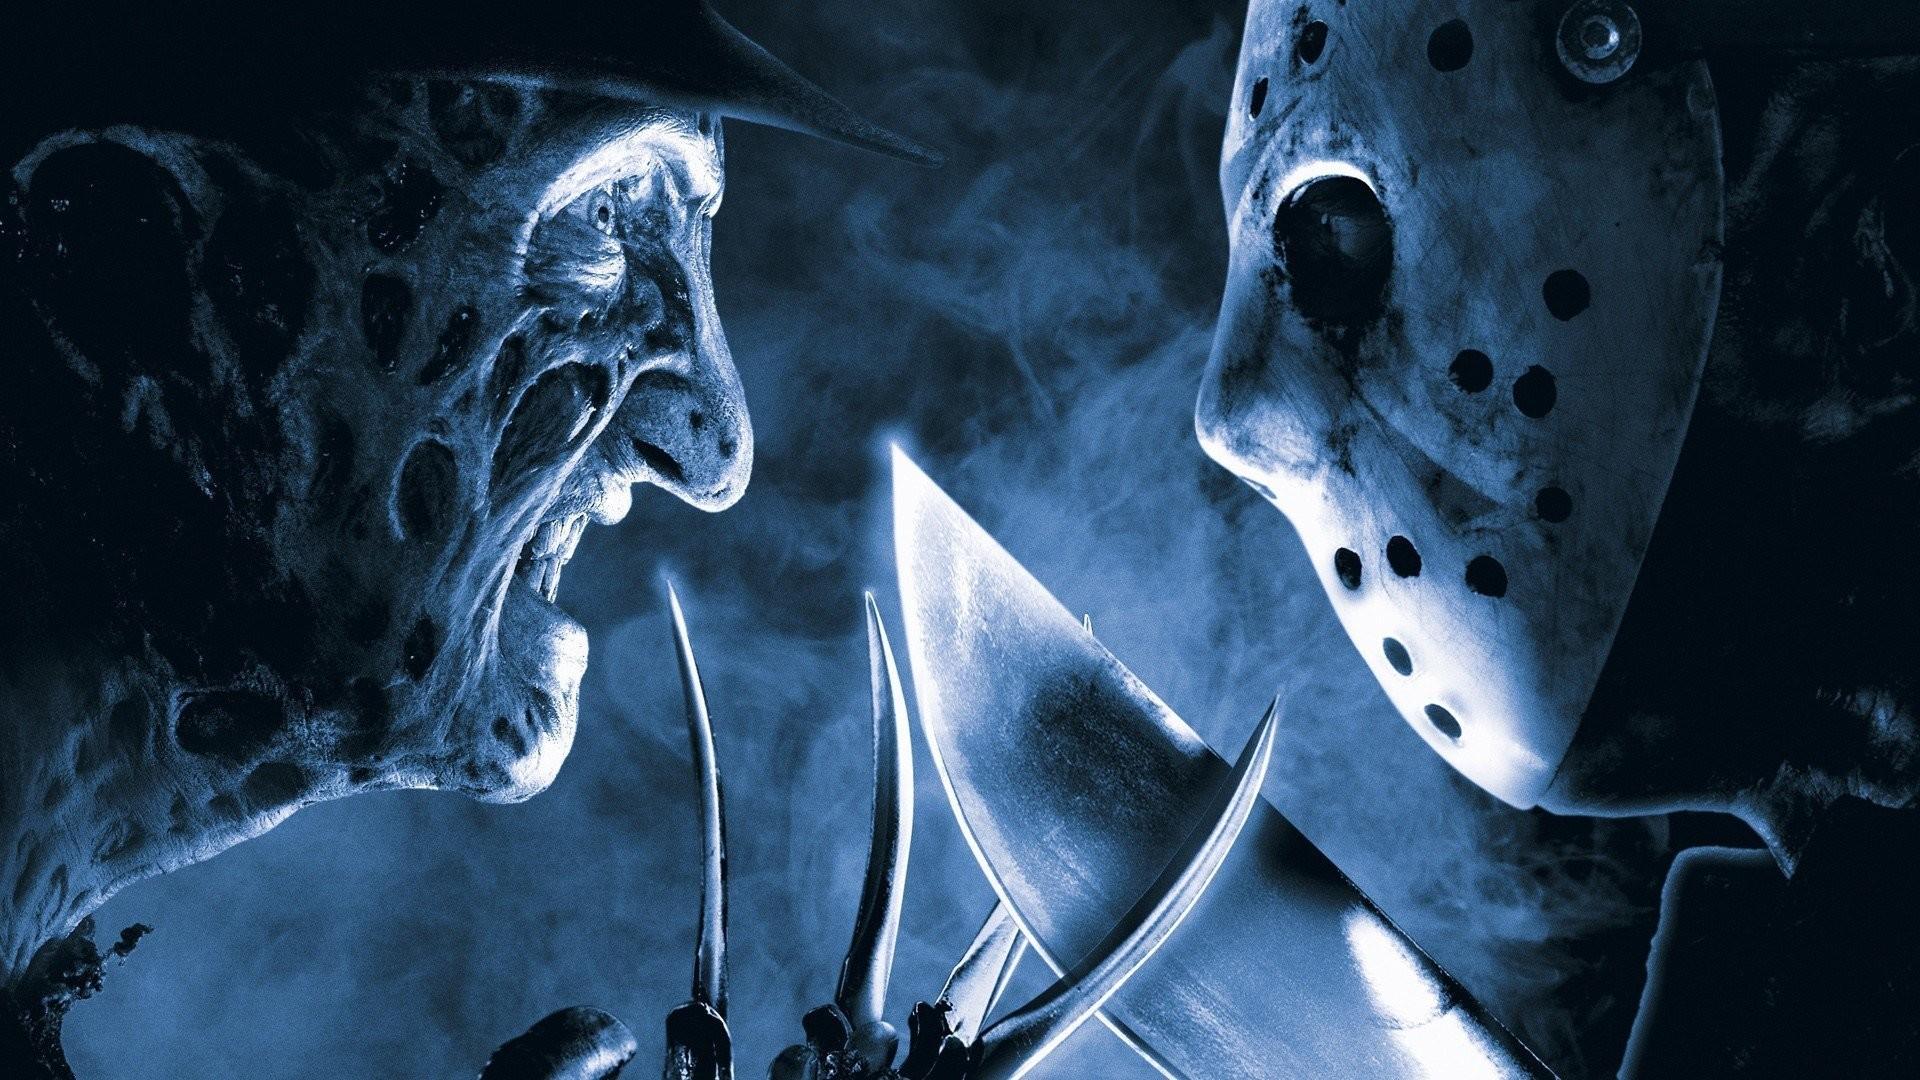 horror movie icons wallpaper 1600×900 – photo #11